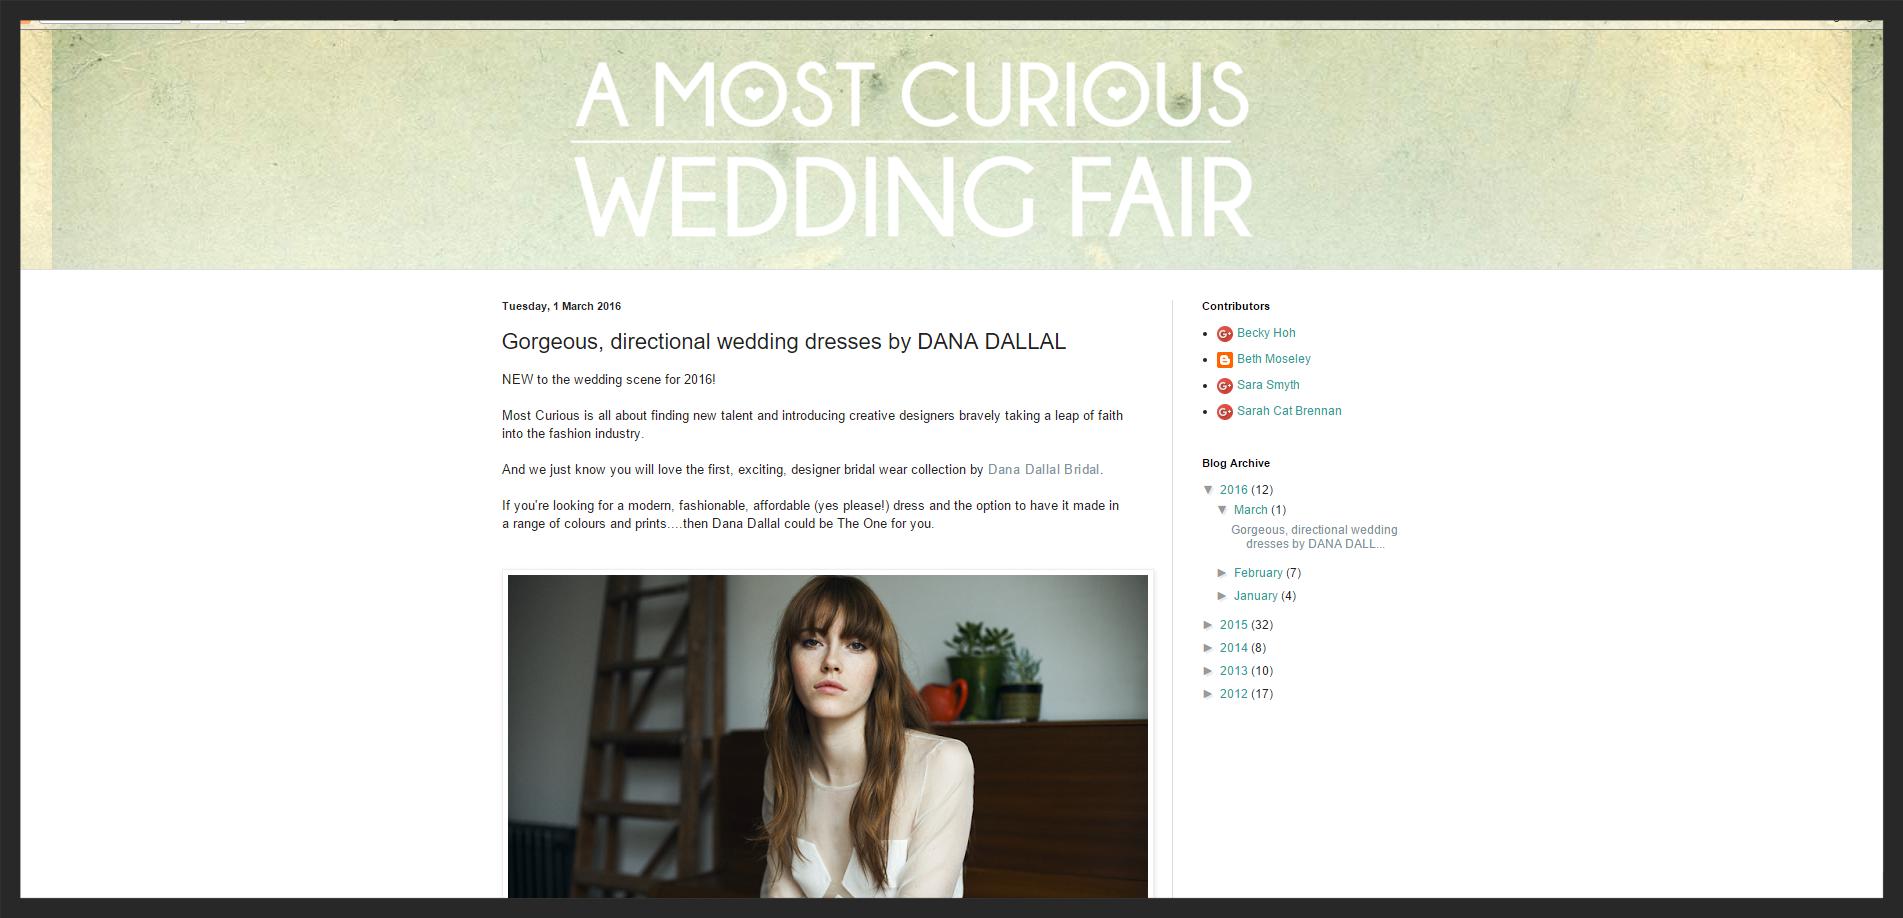 A Most Curious Wedding Fair 01/03/2016